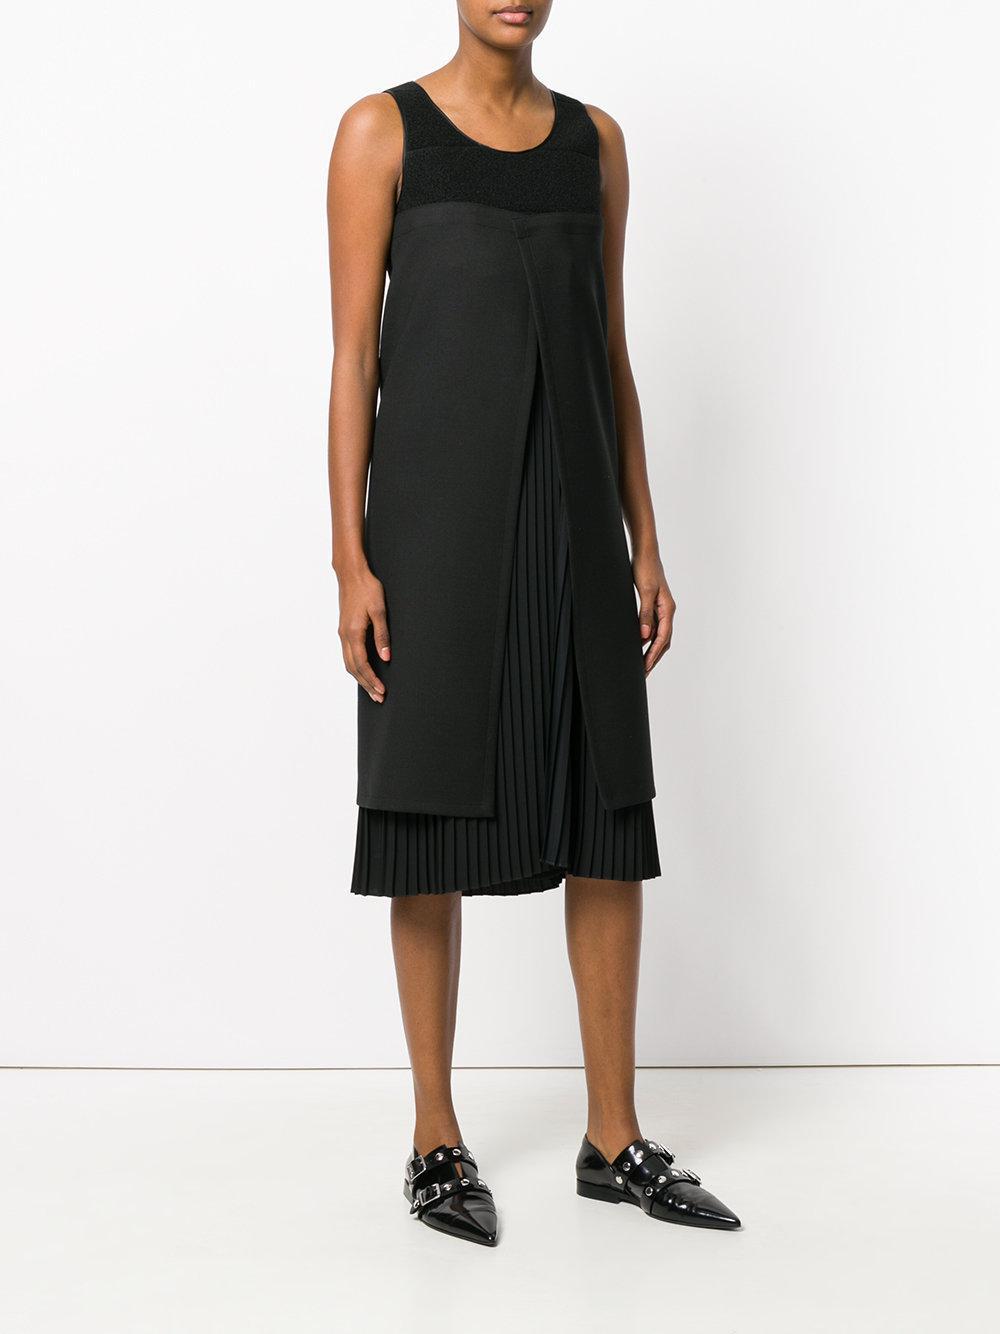 deconstructed pleated dress - Black Maison Martin Margiela AP57Q6